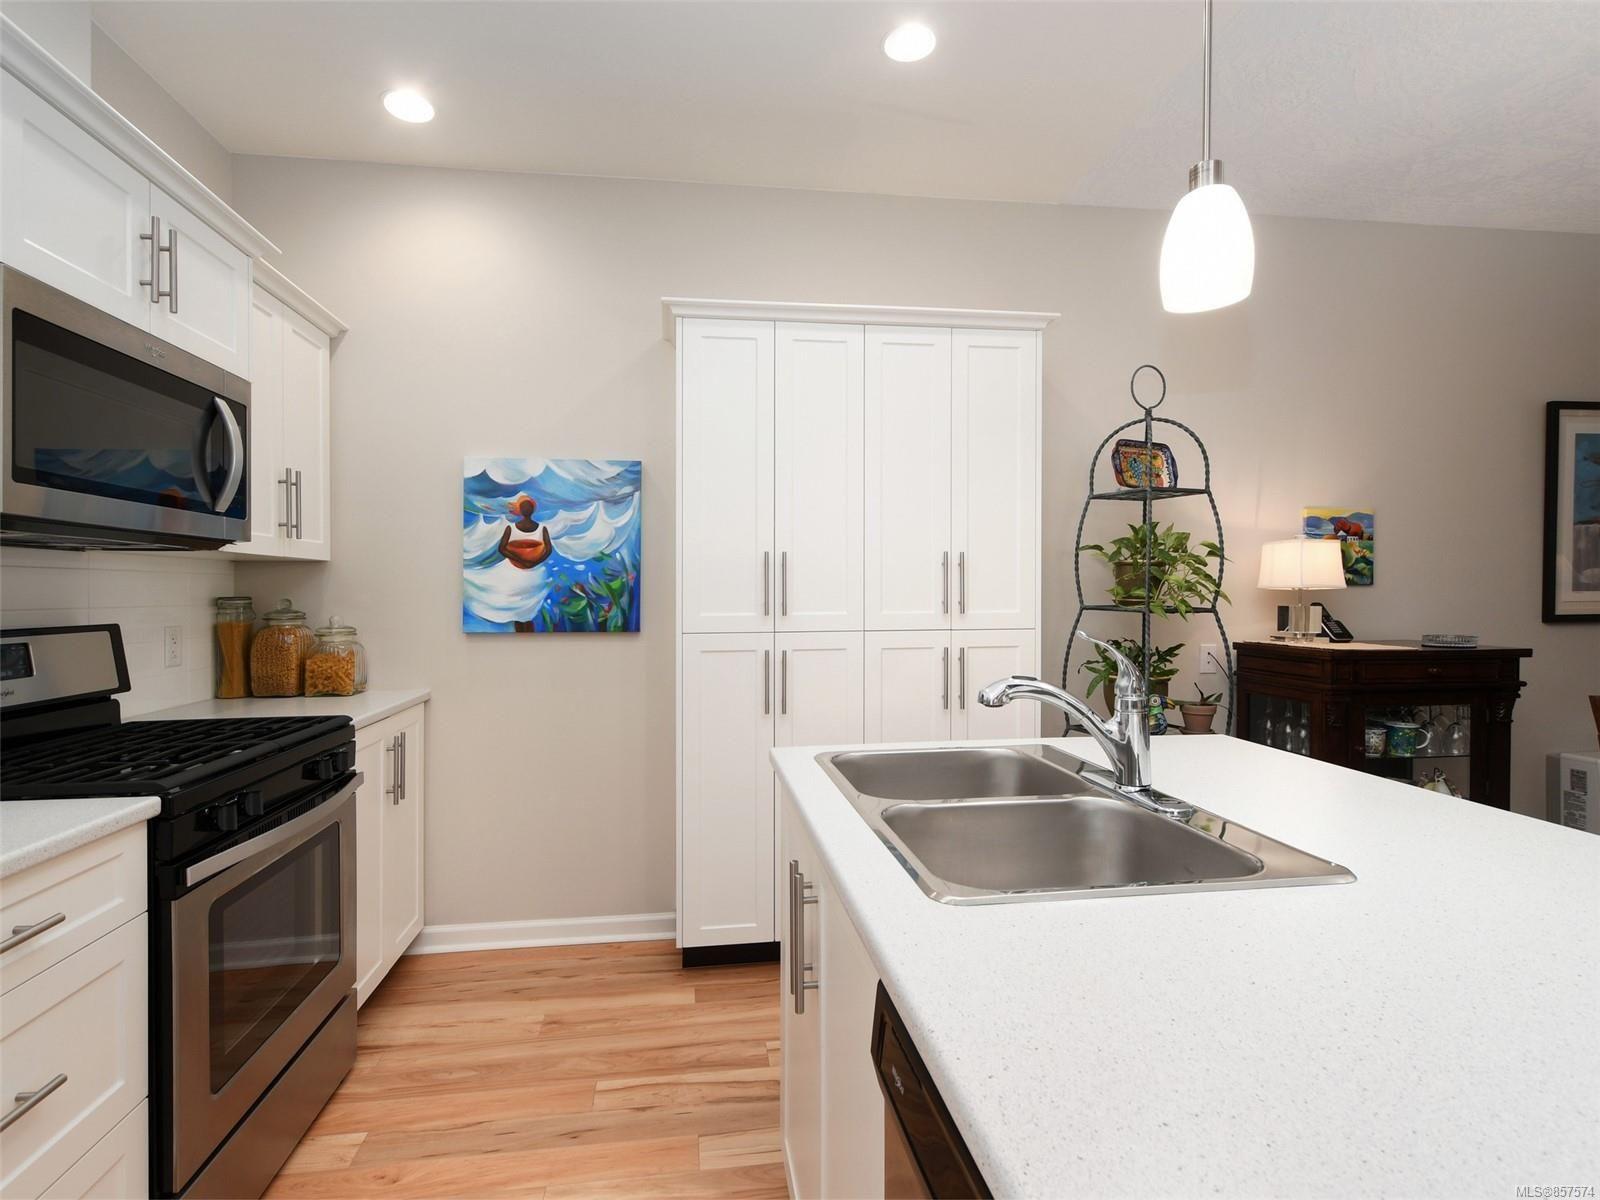 Photo 8: Photos: 6376 Shambrook Dr in : Sk Sunriver House for sale (Sooke)  : MLS®# 857574